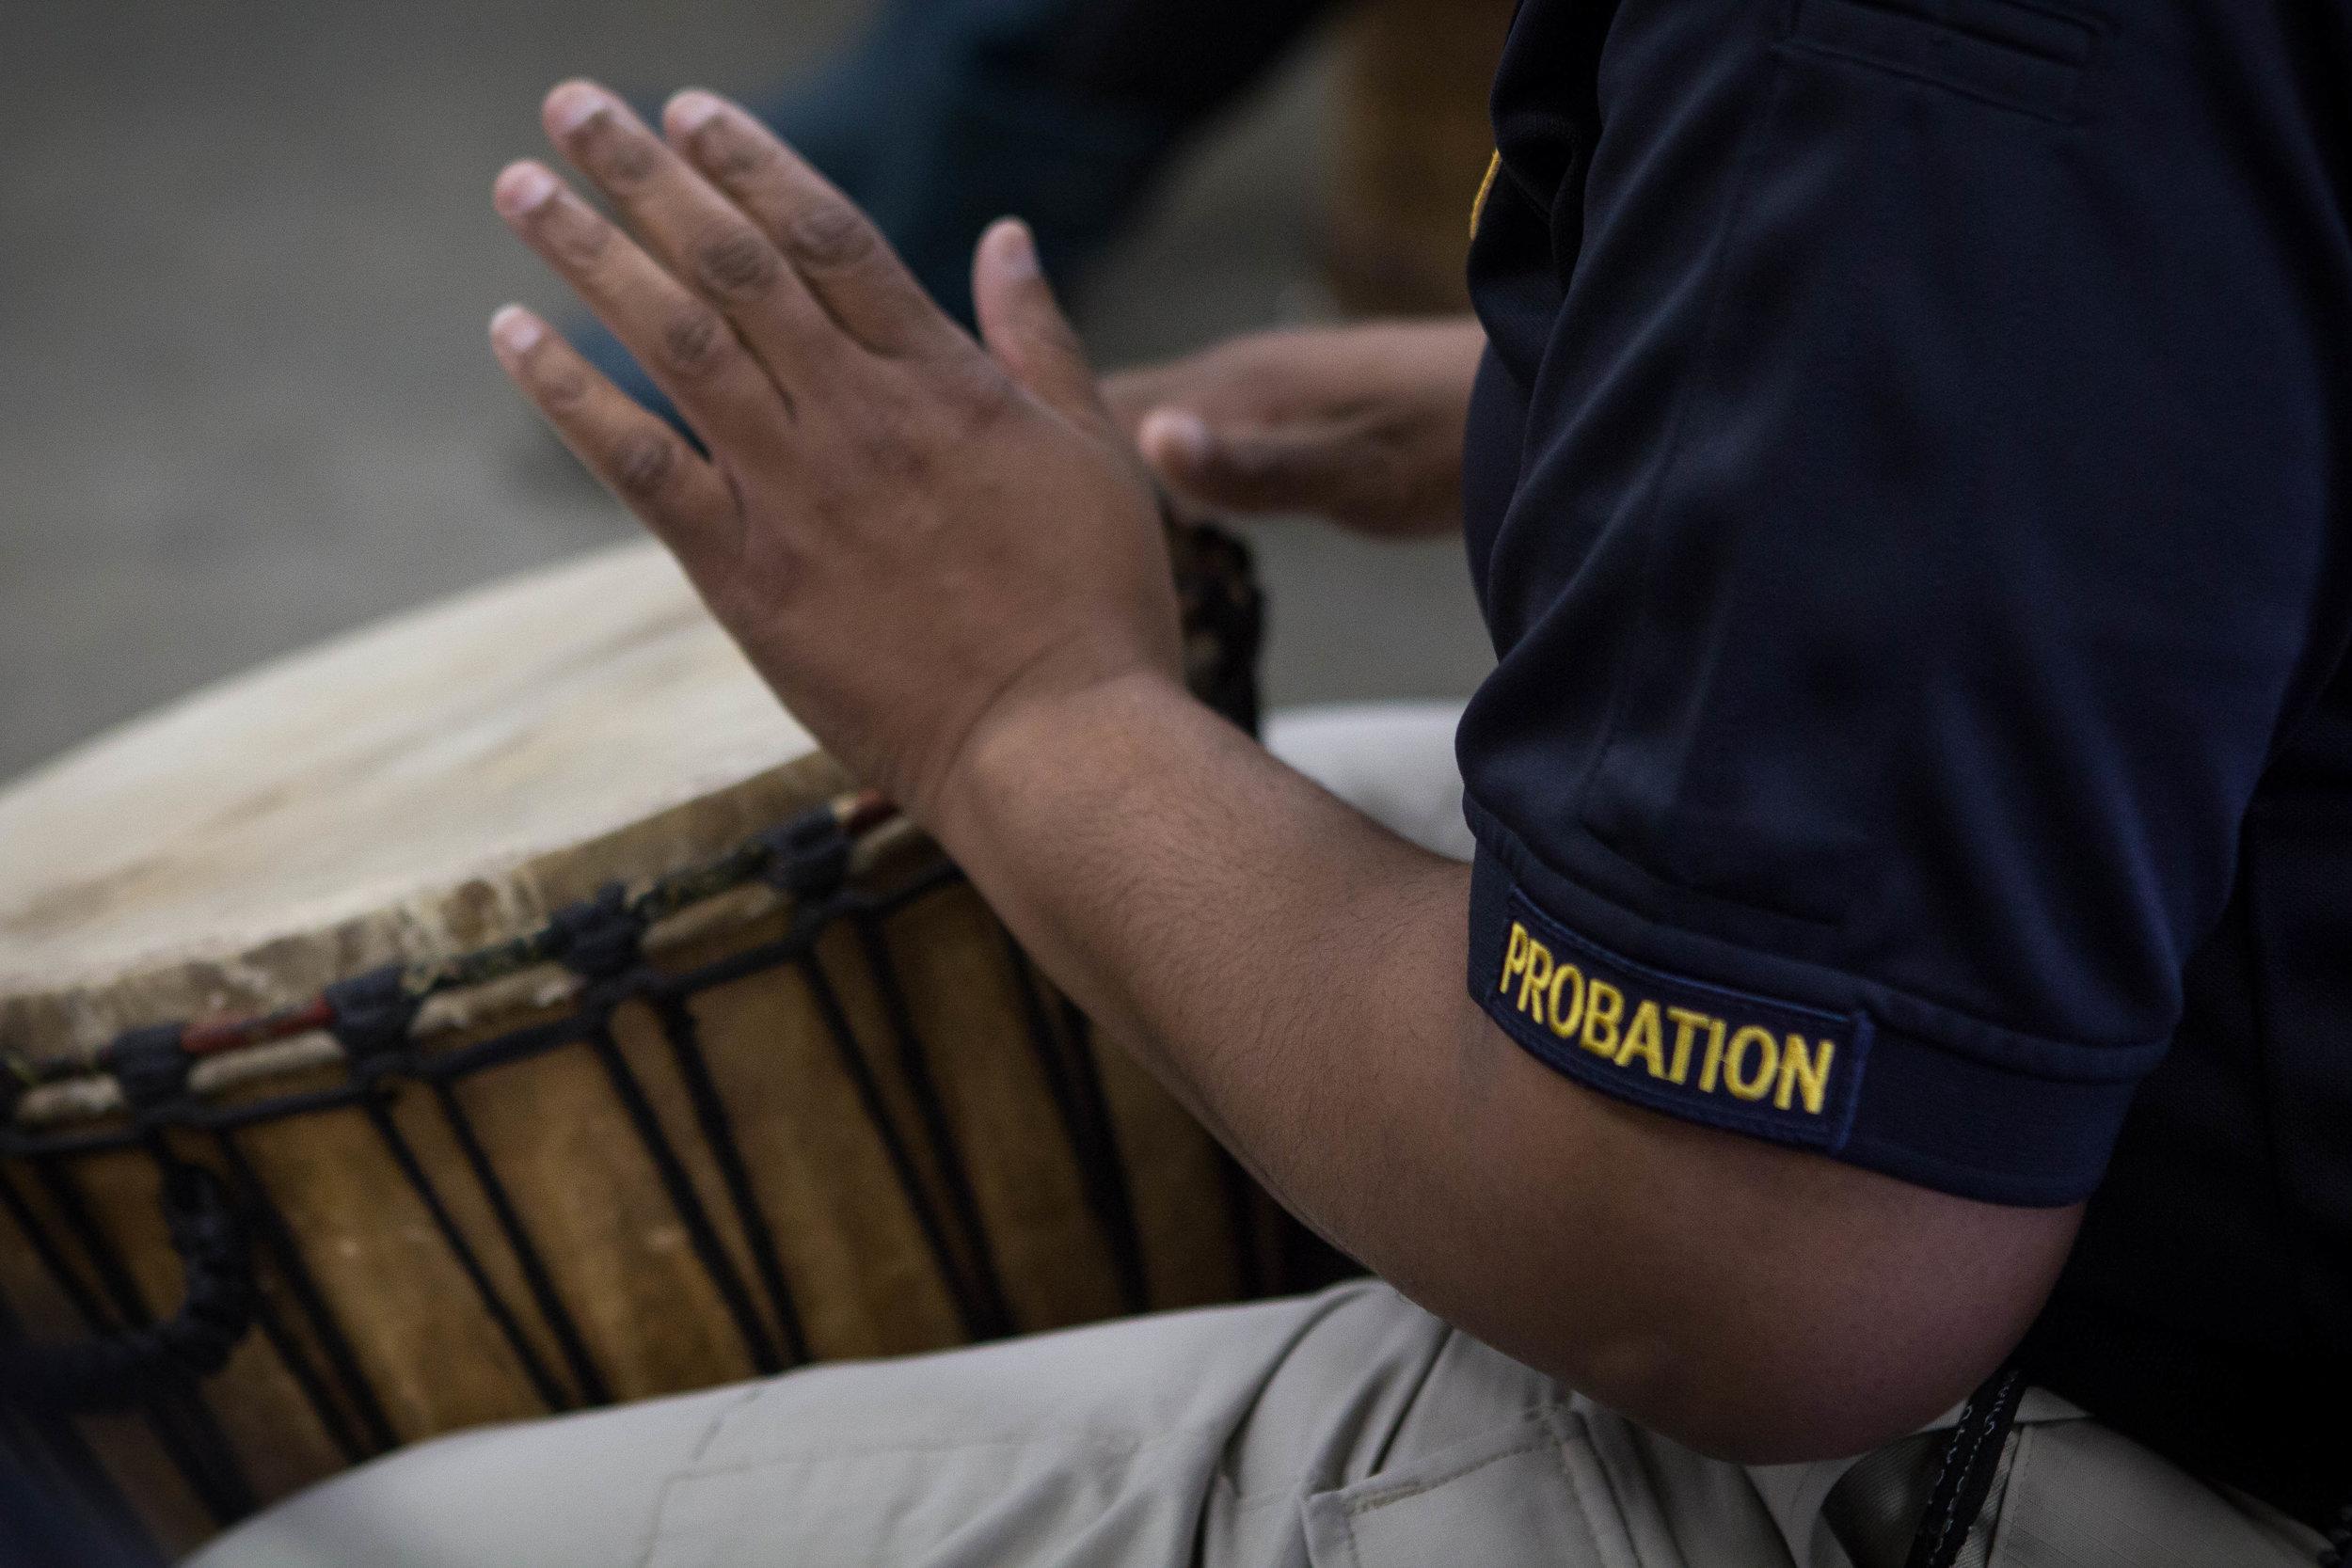 Probation arm.jpg